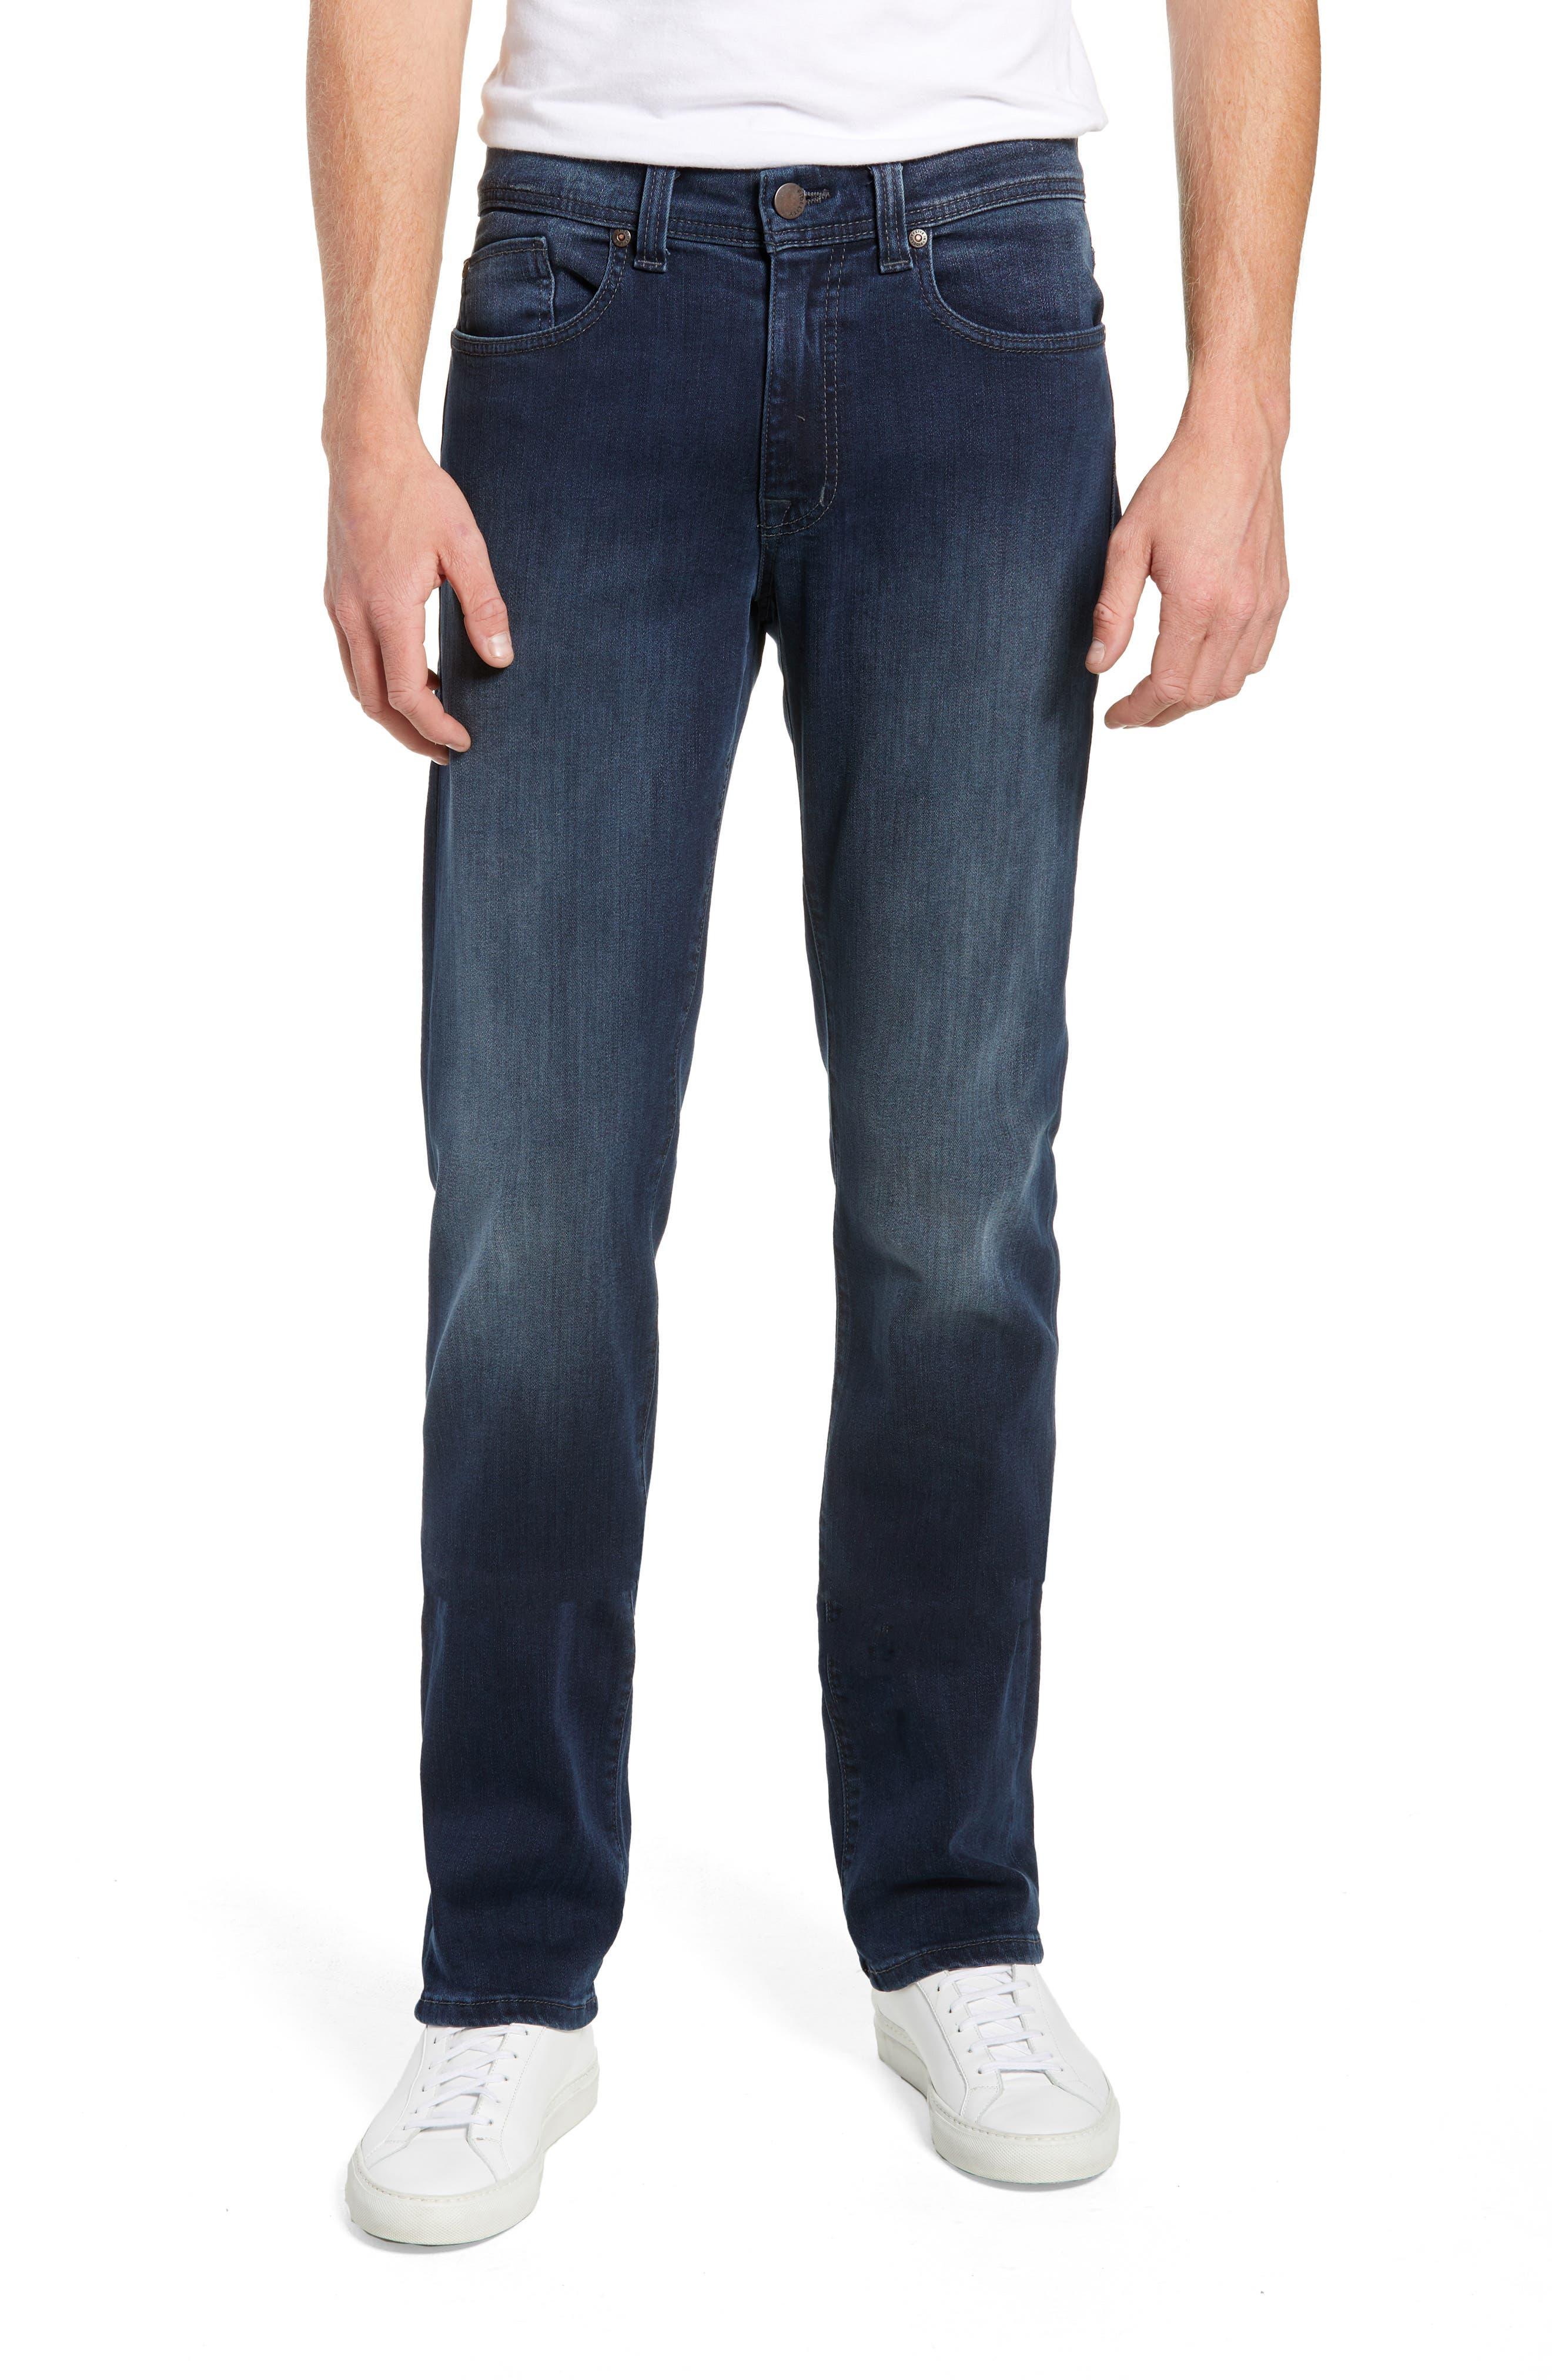 Fidelity Slim Straight Leg Jeans,                             Main thumbnail 1, color,                             BEL AIR BLUE